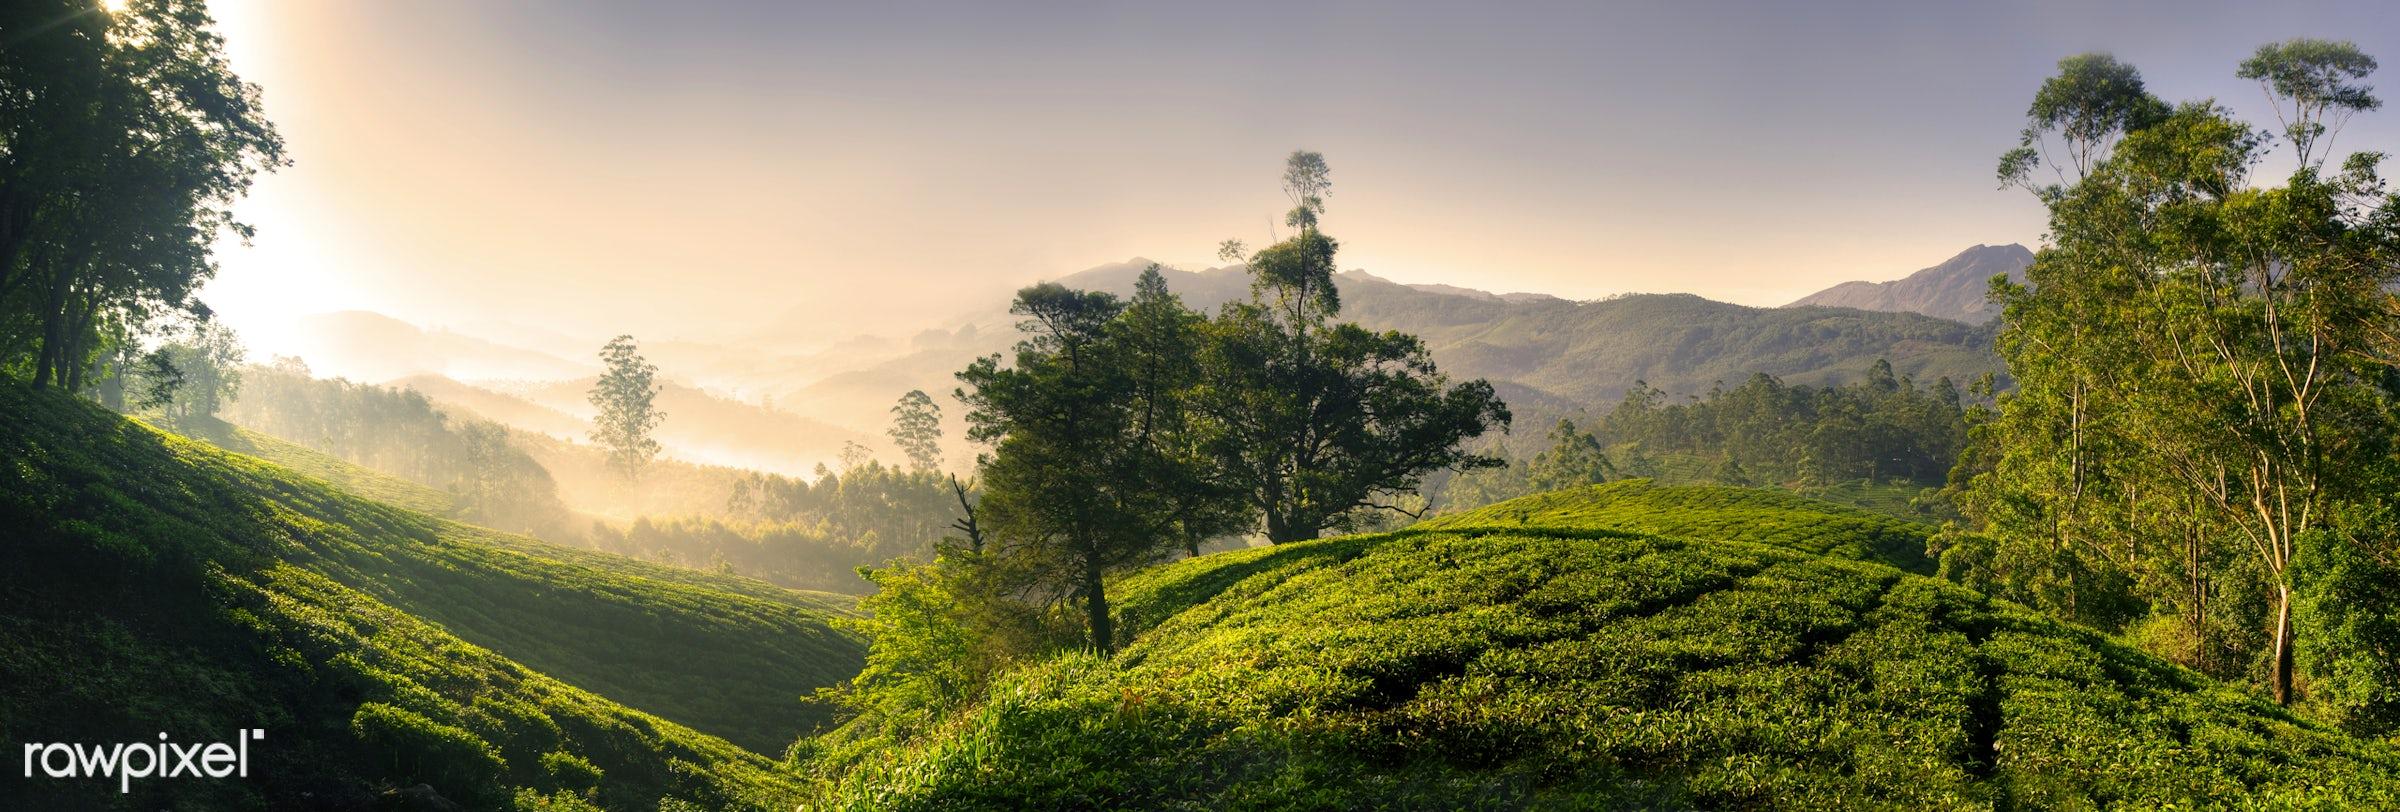 Panorama of a tea plantation at sunrise, Kerela, India - agriculture, awe, beauty, black tea, bright, cloudscape, day,...